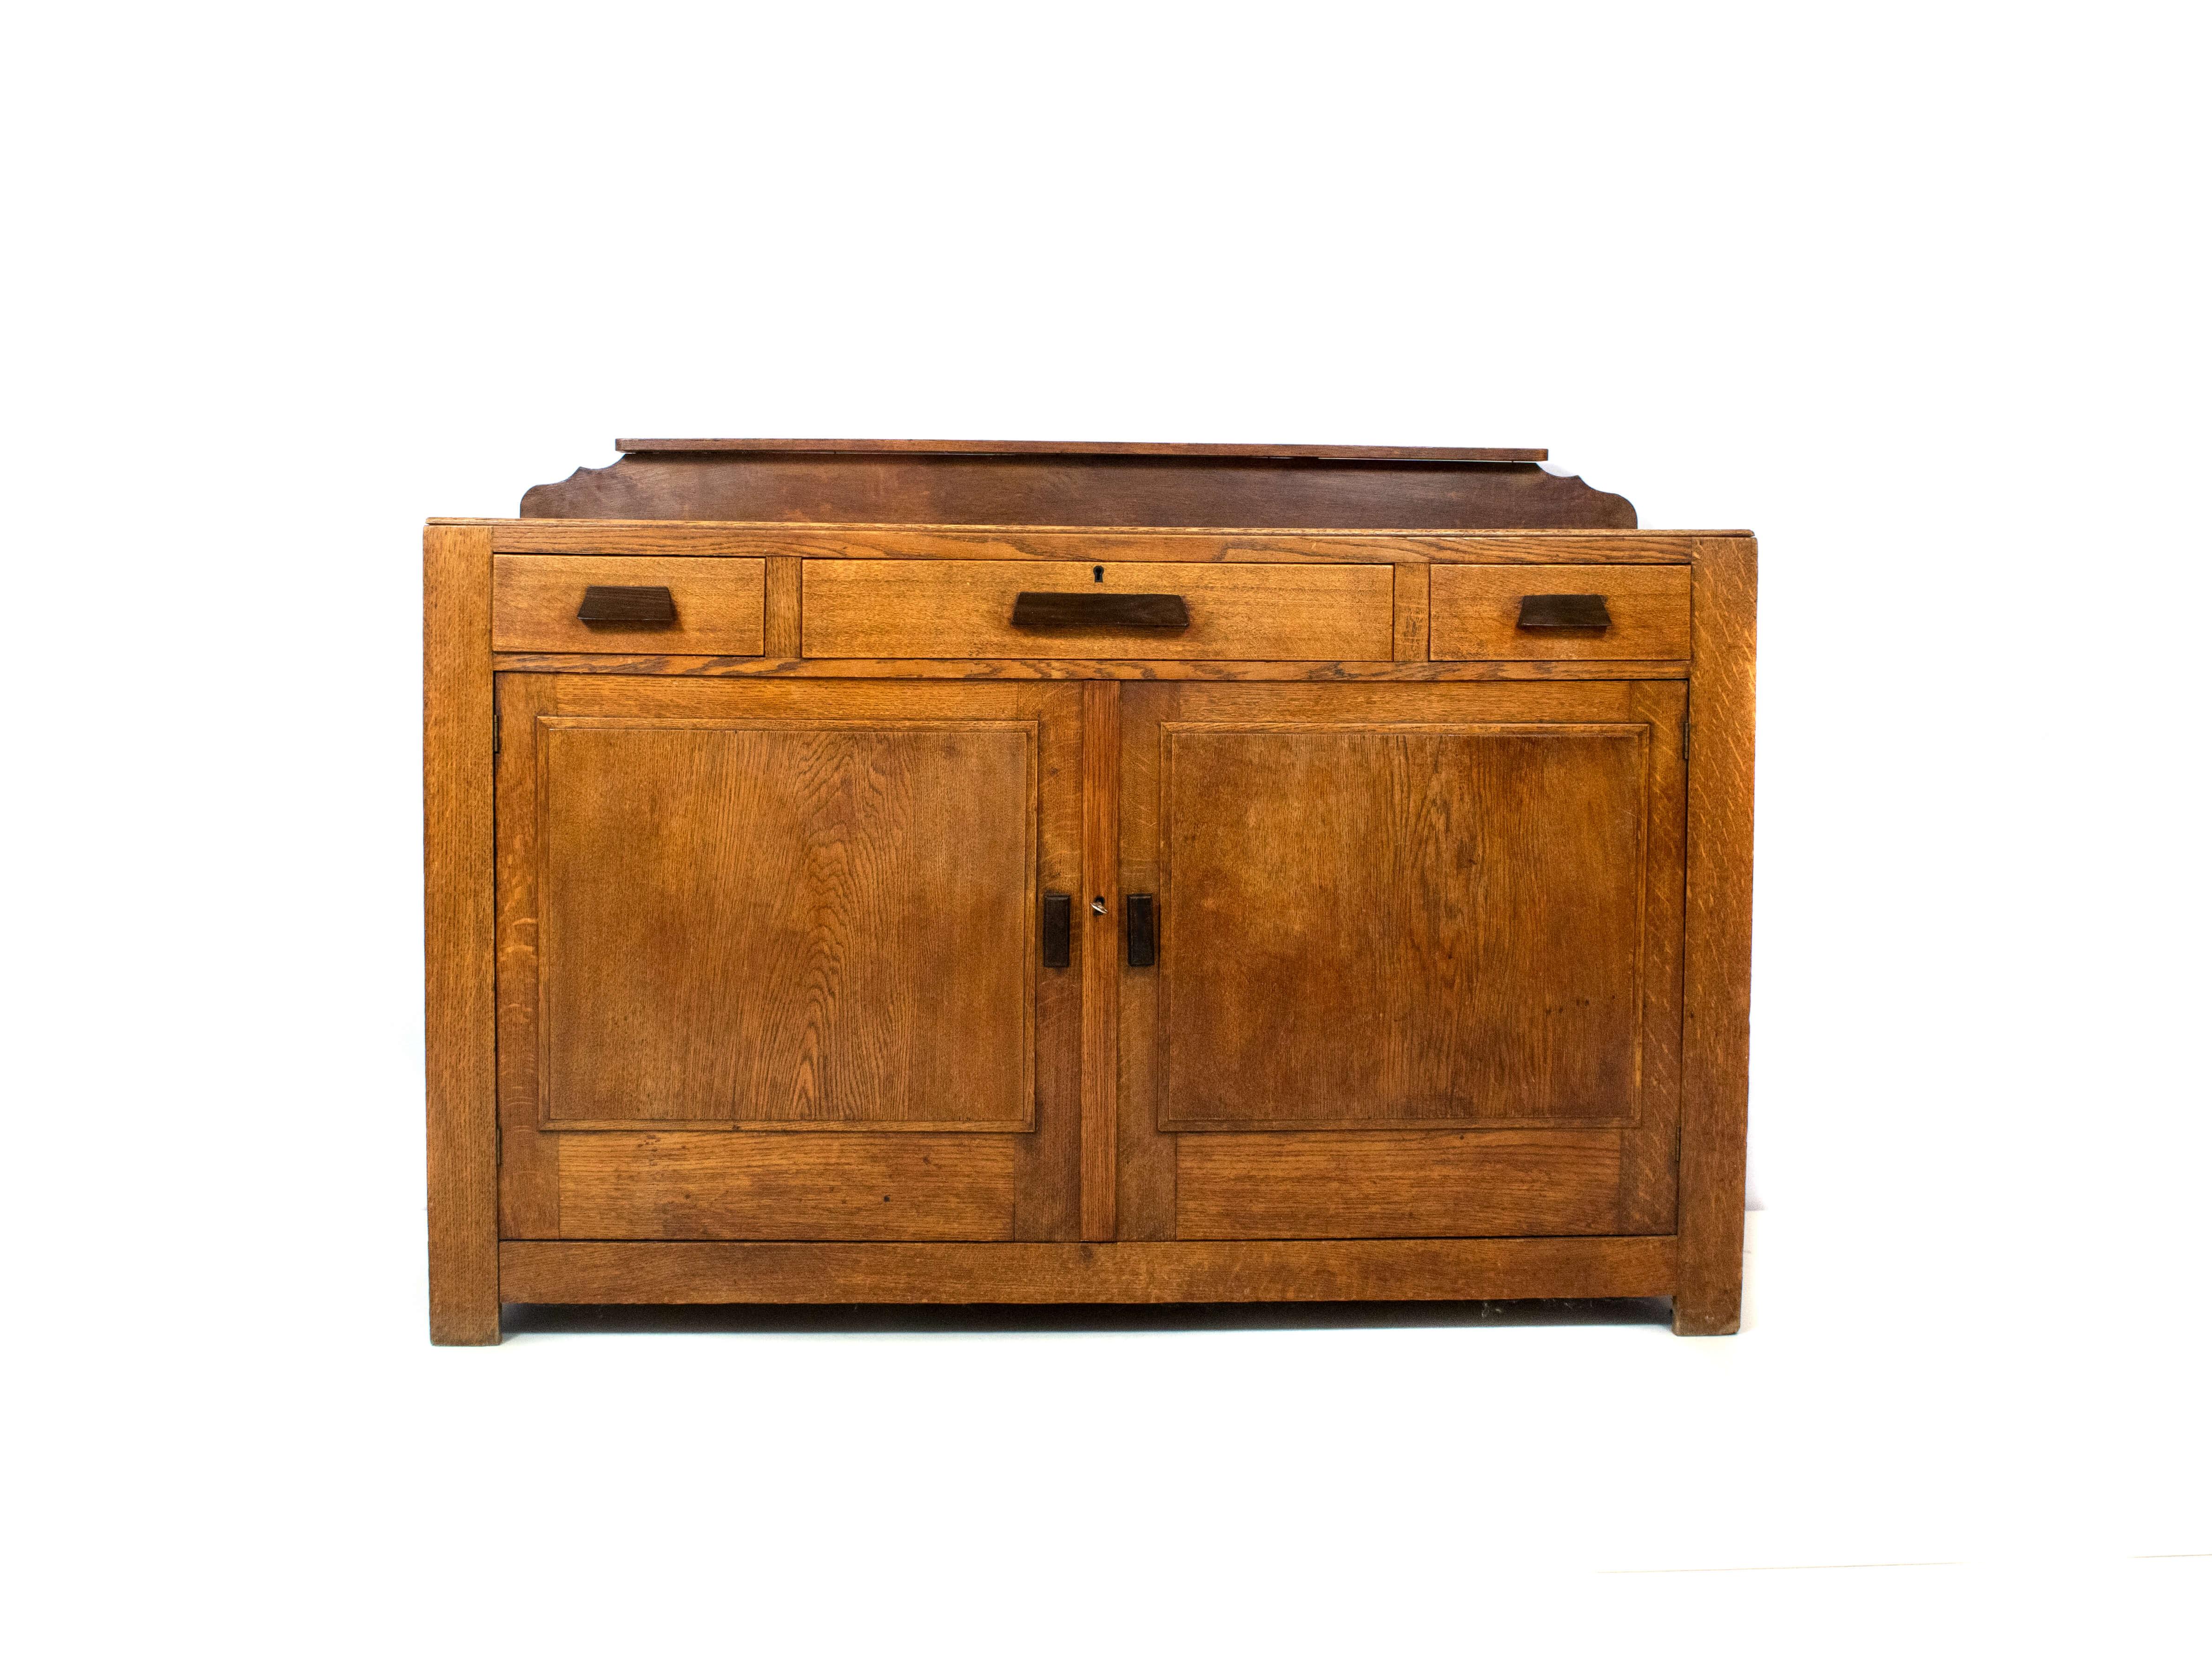 Minimalistic Amsterdam School Dresser, The Netherlands ~1920s